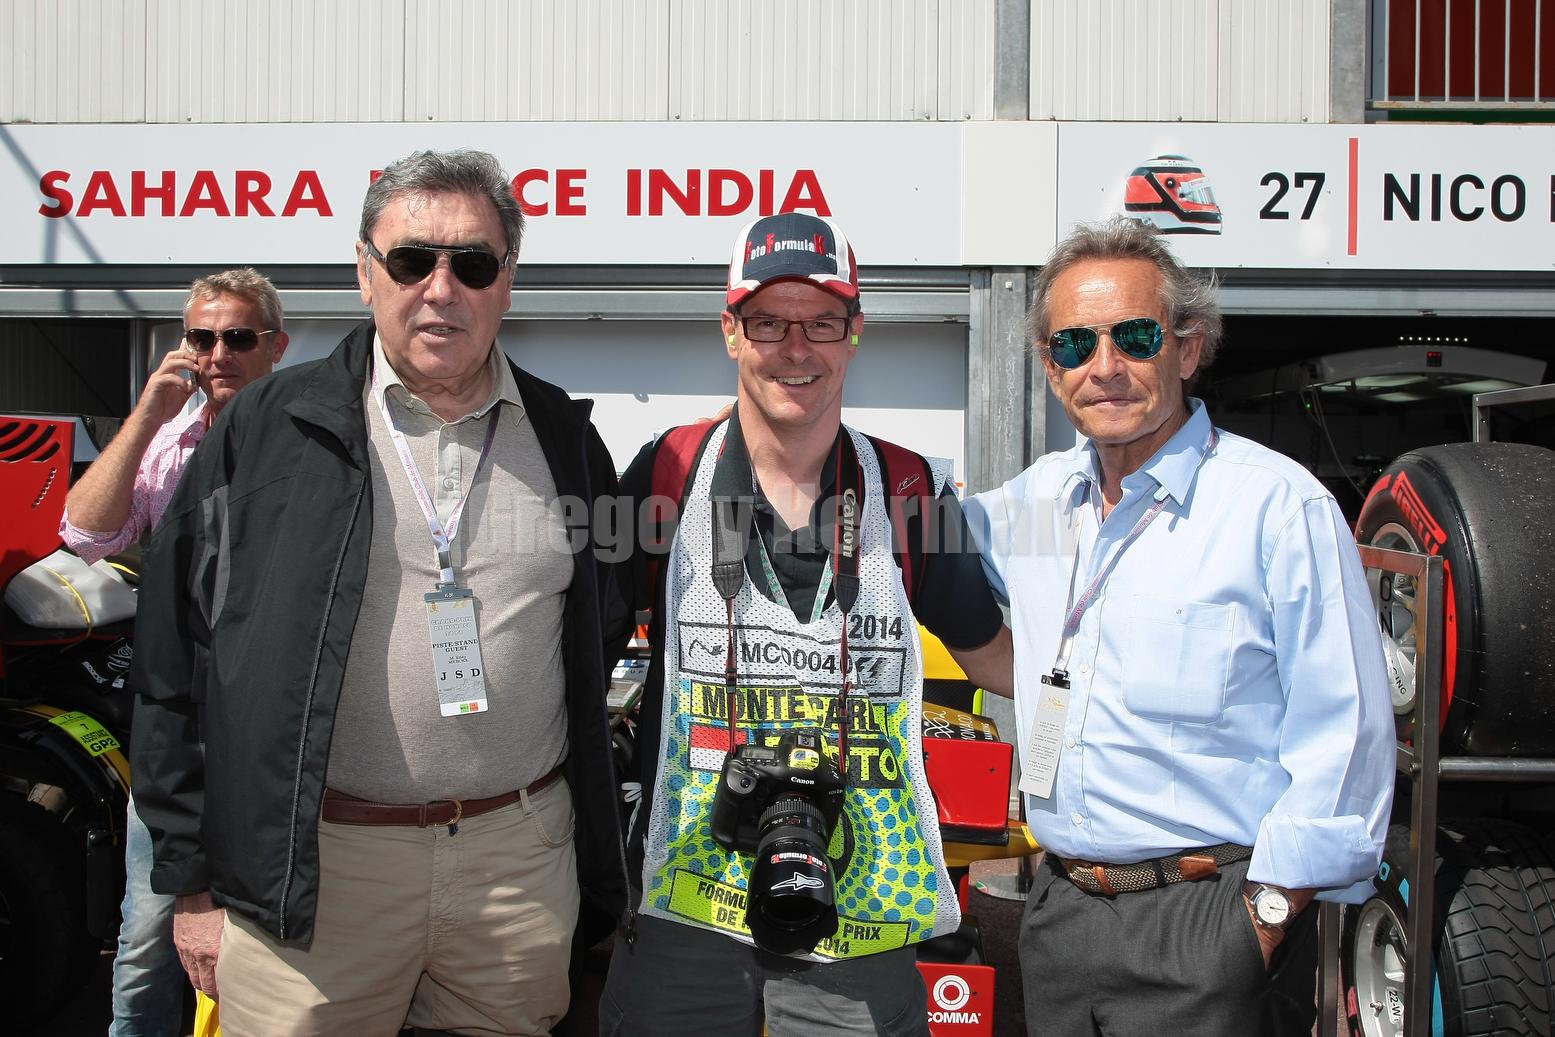 With his two childhood idols, Eddy Merckx and Jacky Ickx